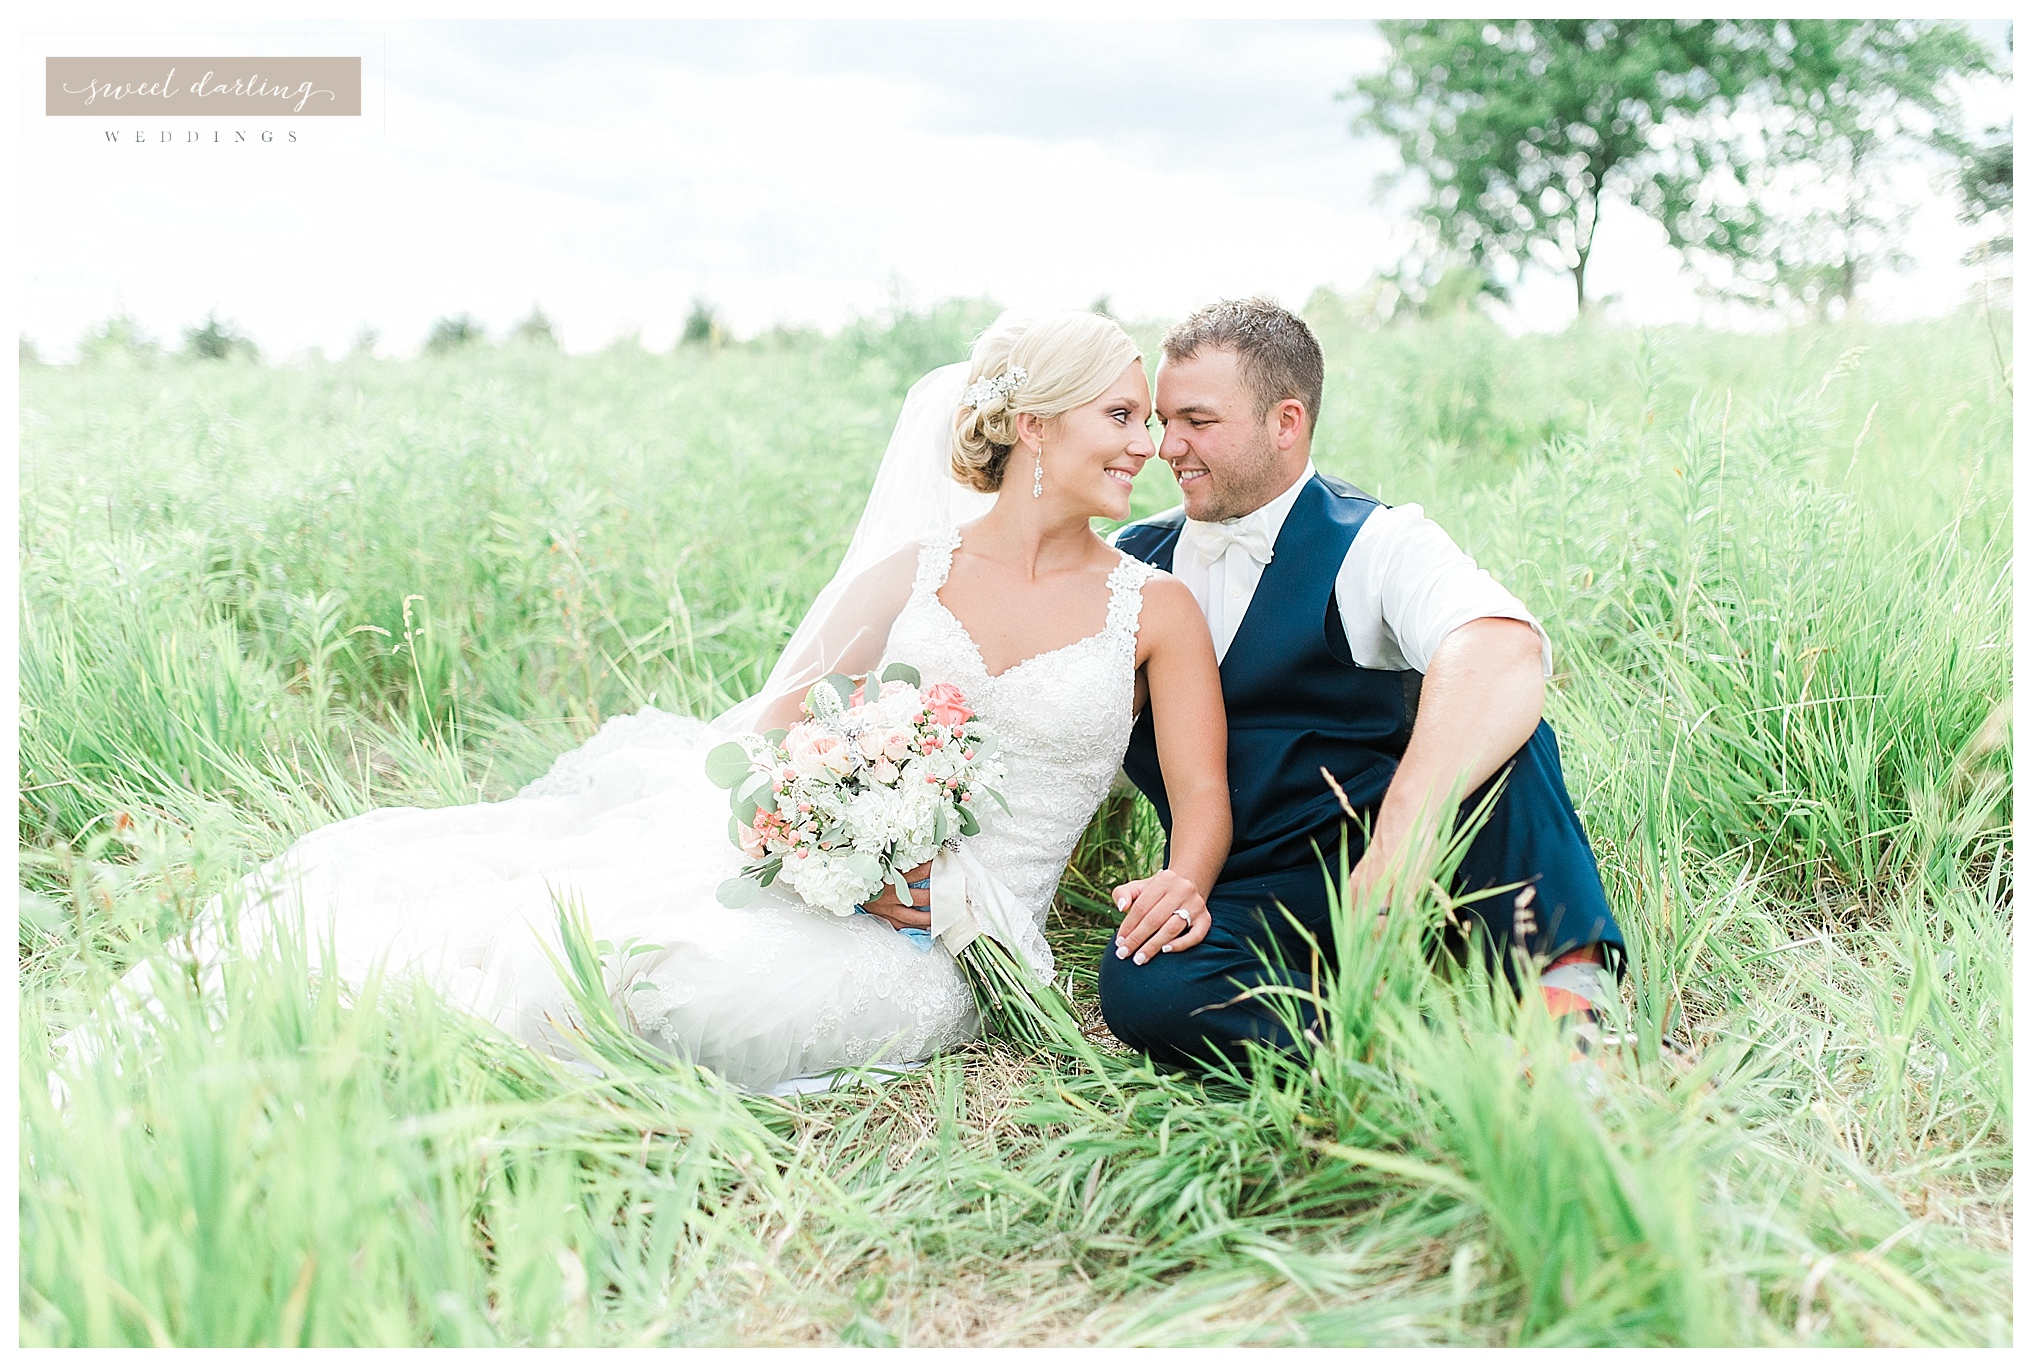 Paxton-illinois-engelbrecht-farmstead-romantic-wedding-photographer-sweet-darling-weddings_1247.jpg